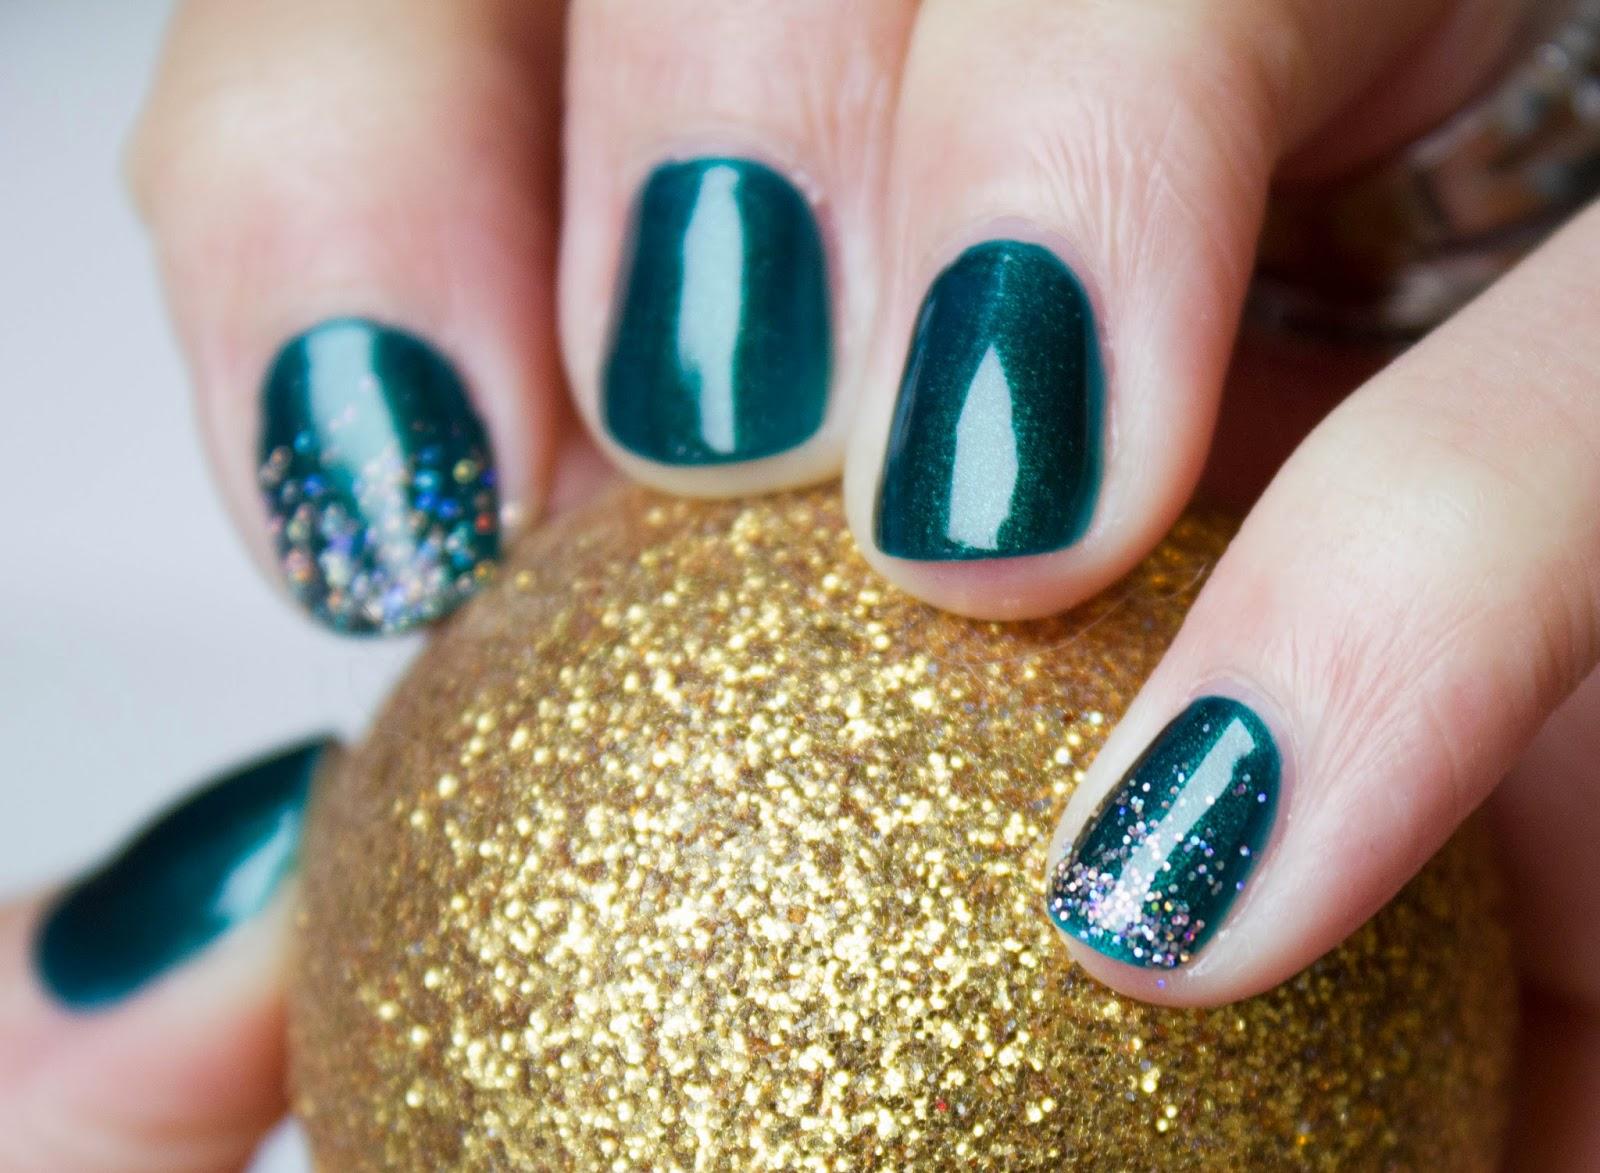 nail manucure vernis vert noel nailart mani pailette dégradé or kiko multichrome